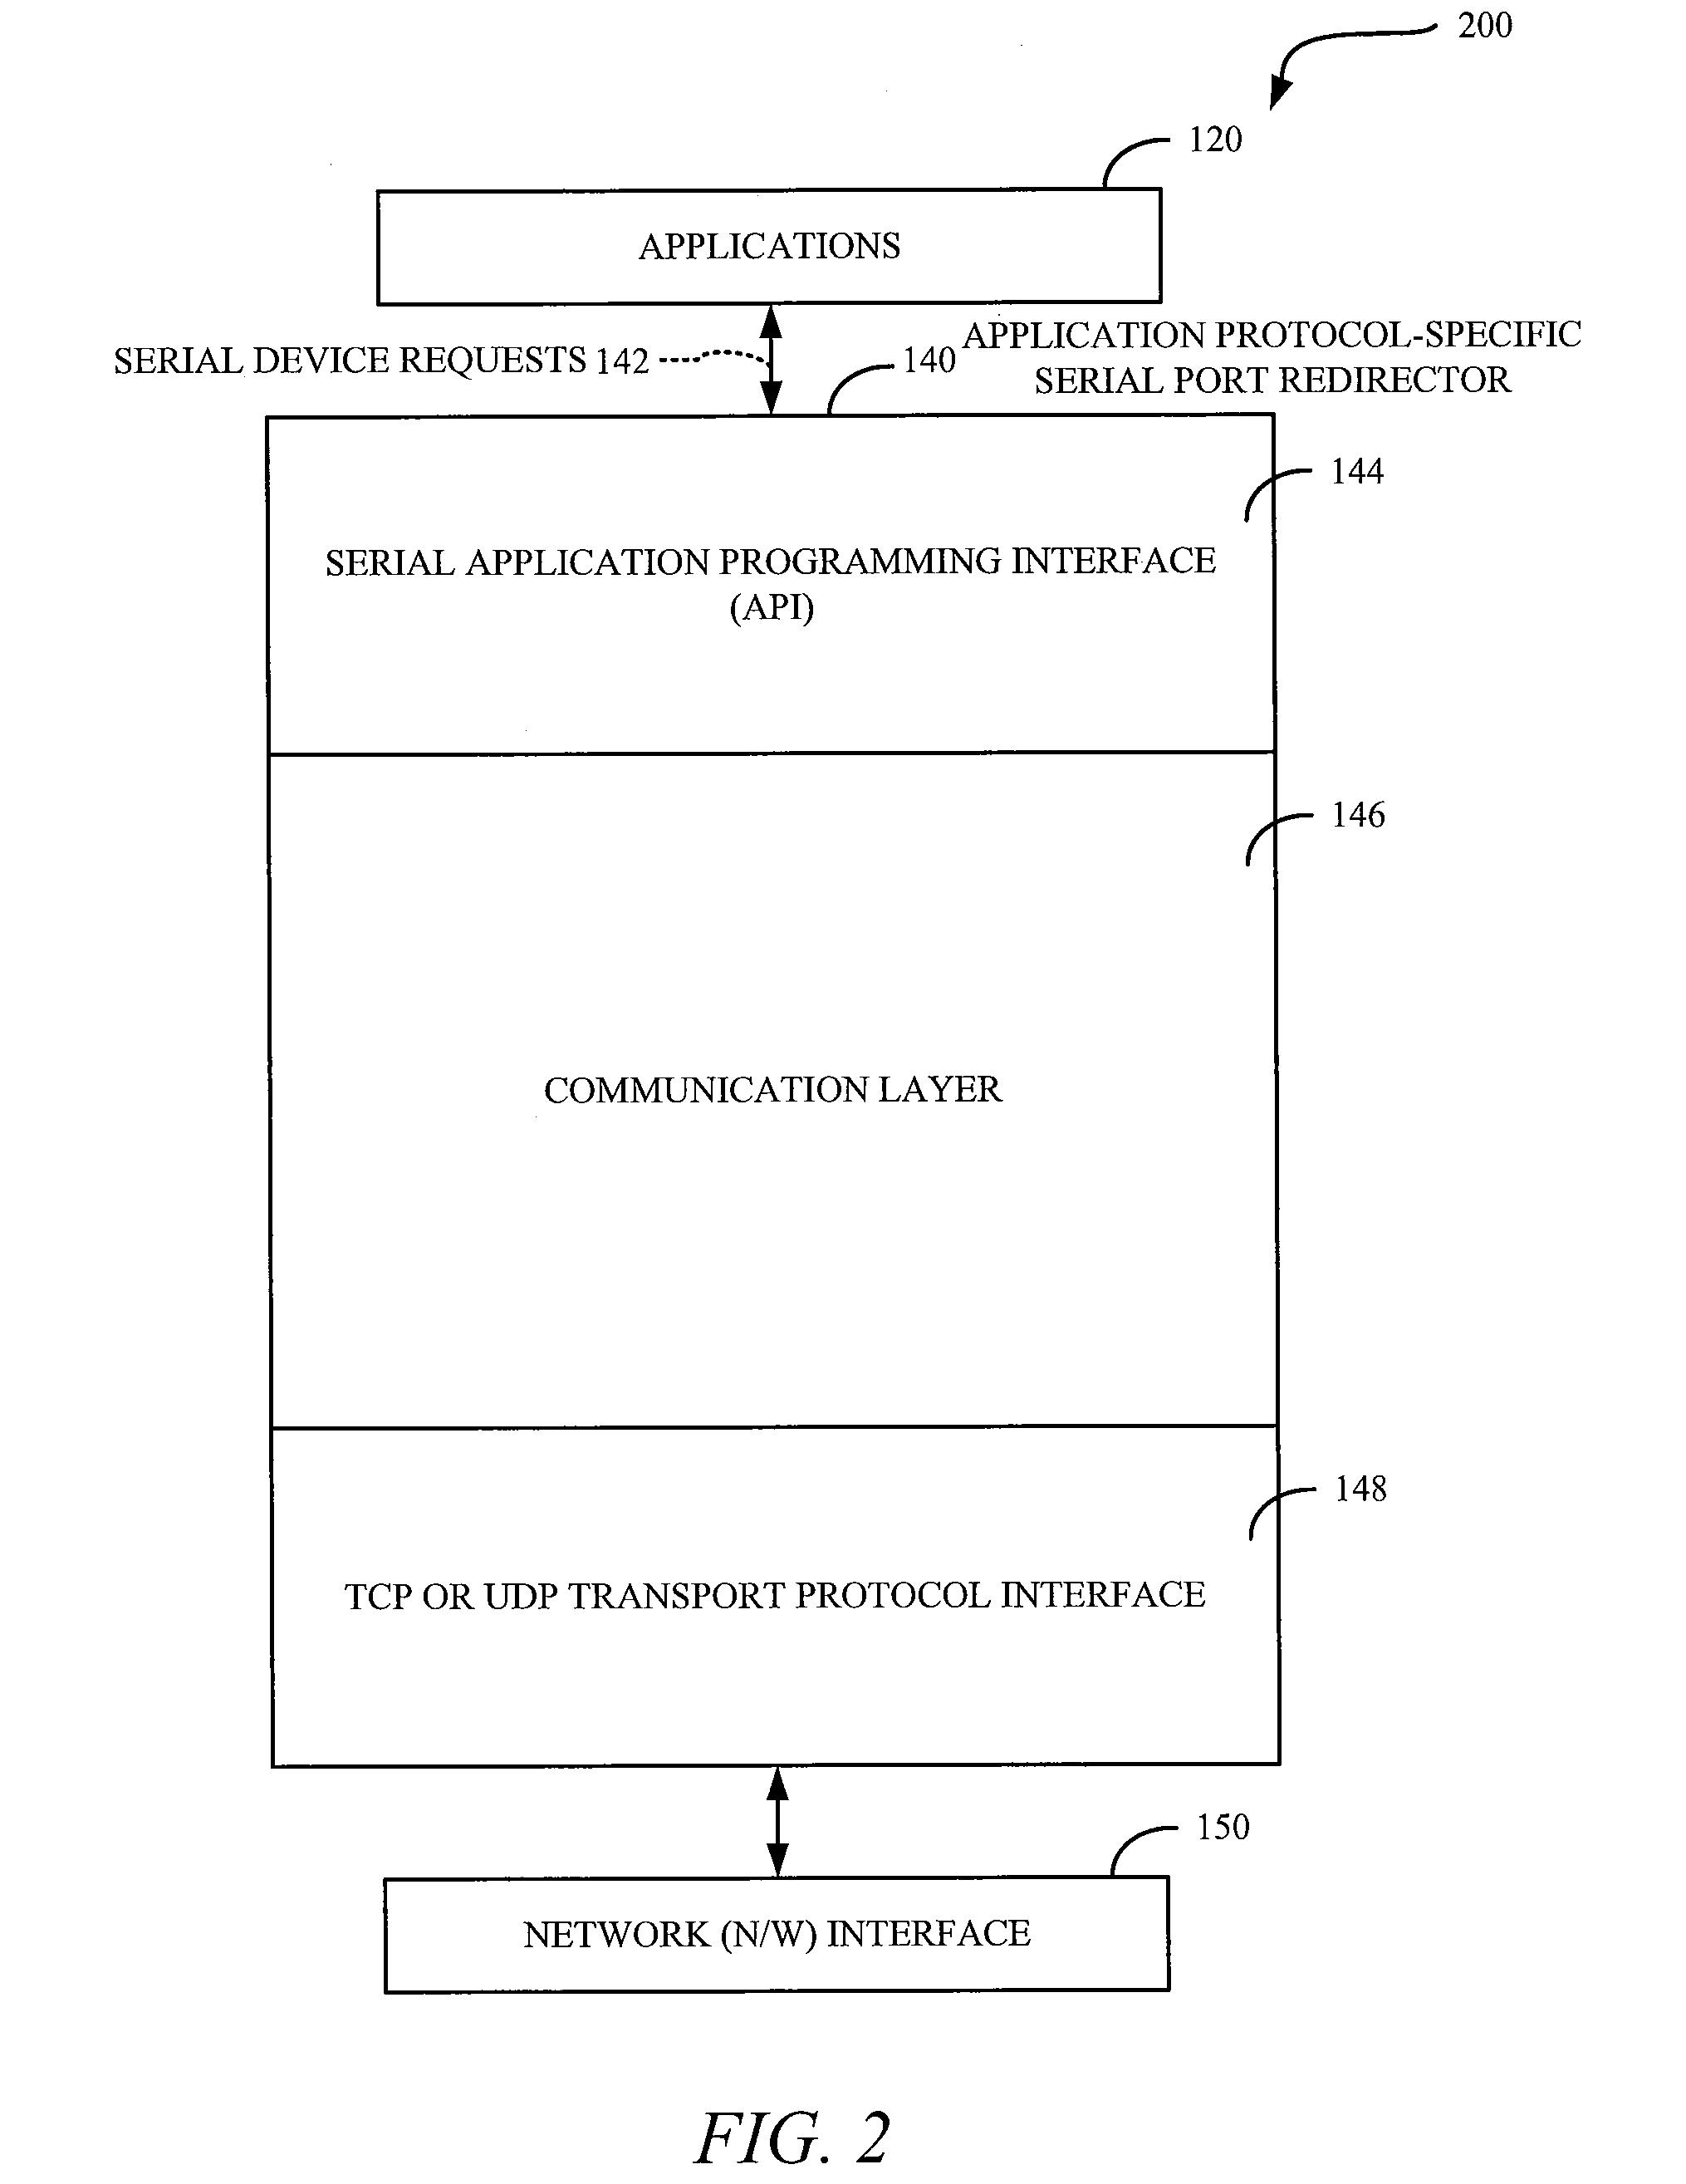 Brevet US20100251269 - Application-specific serial port